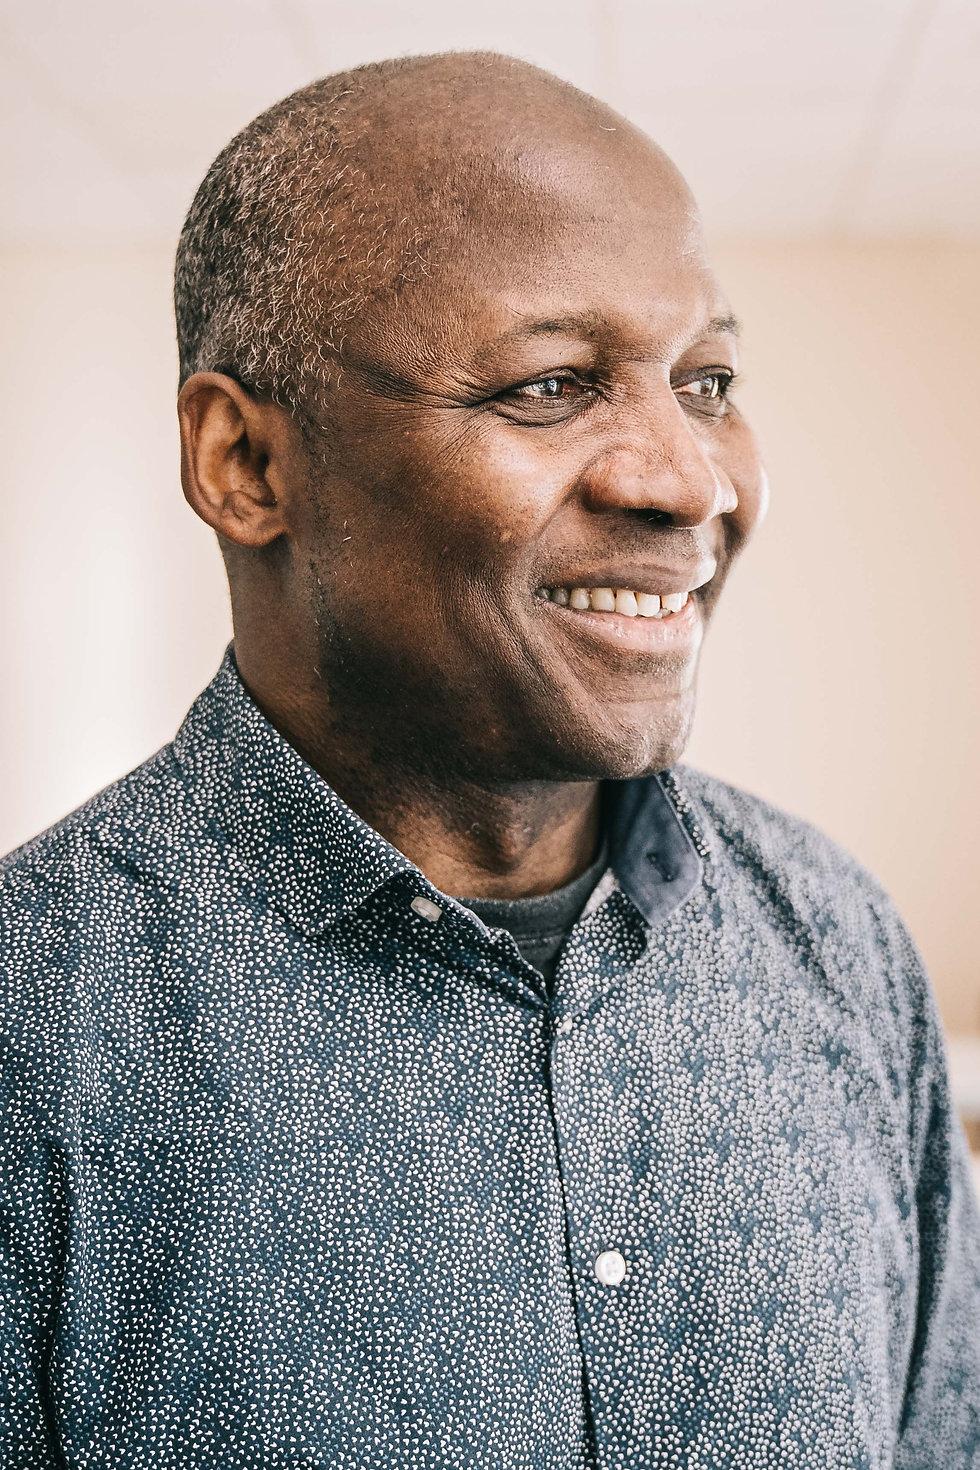 a portrait of a smiling man vhs